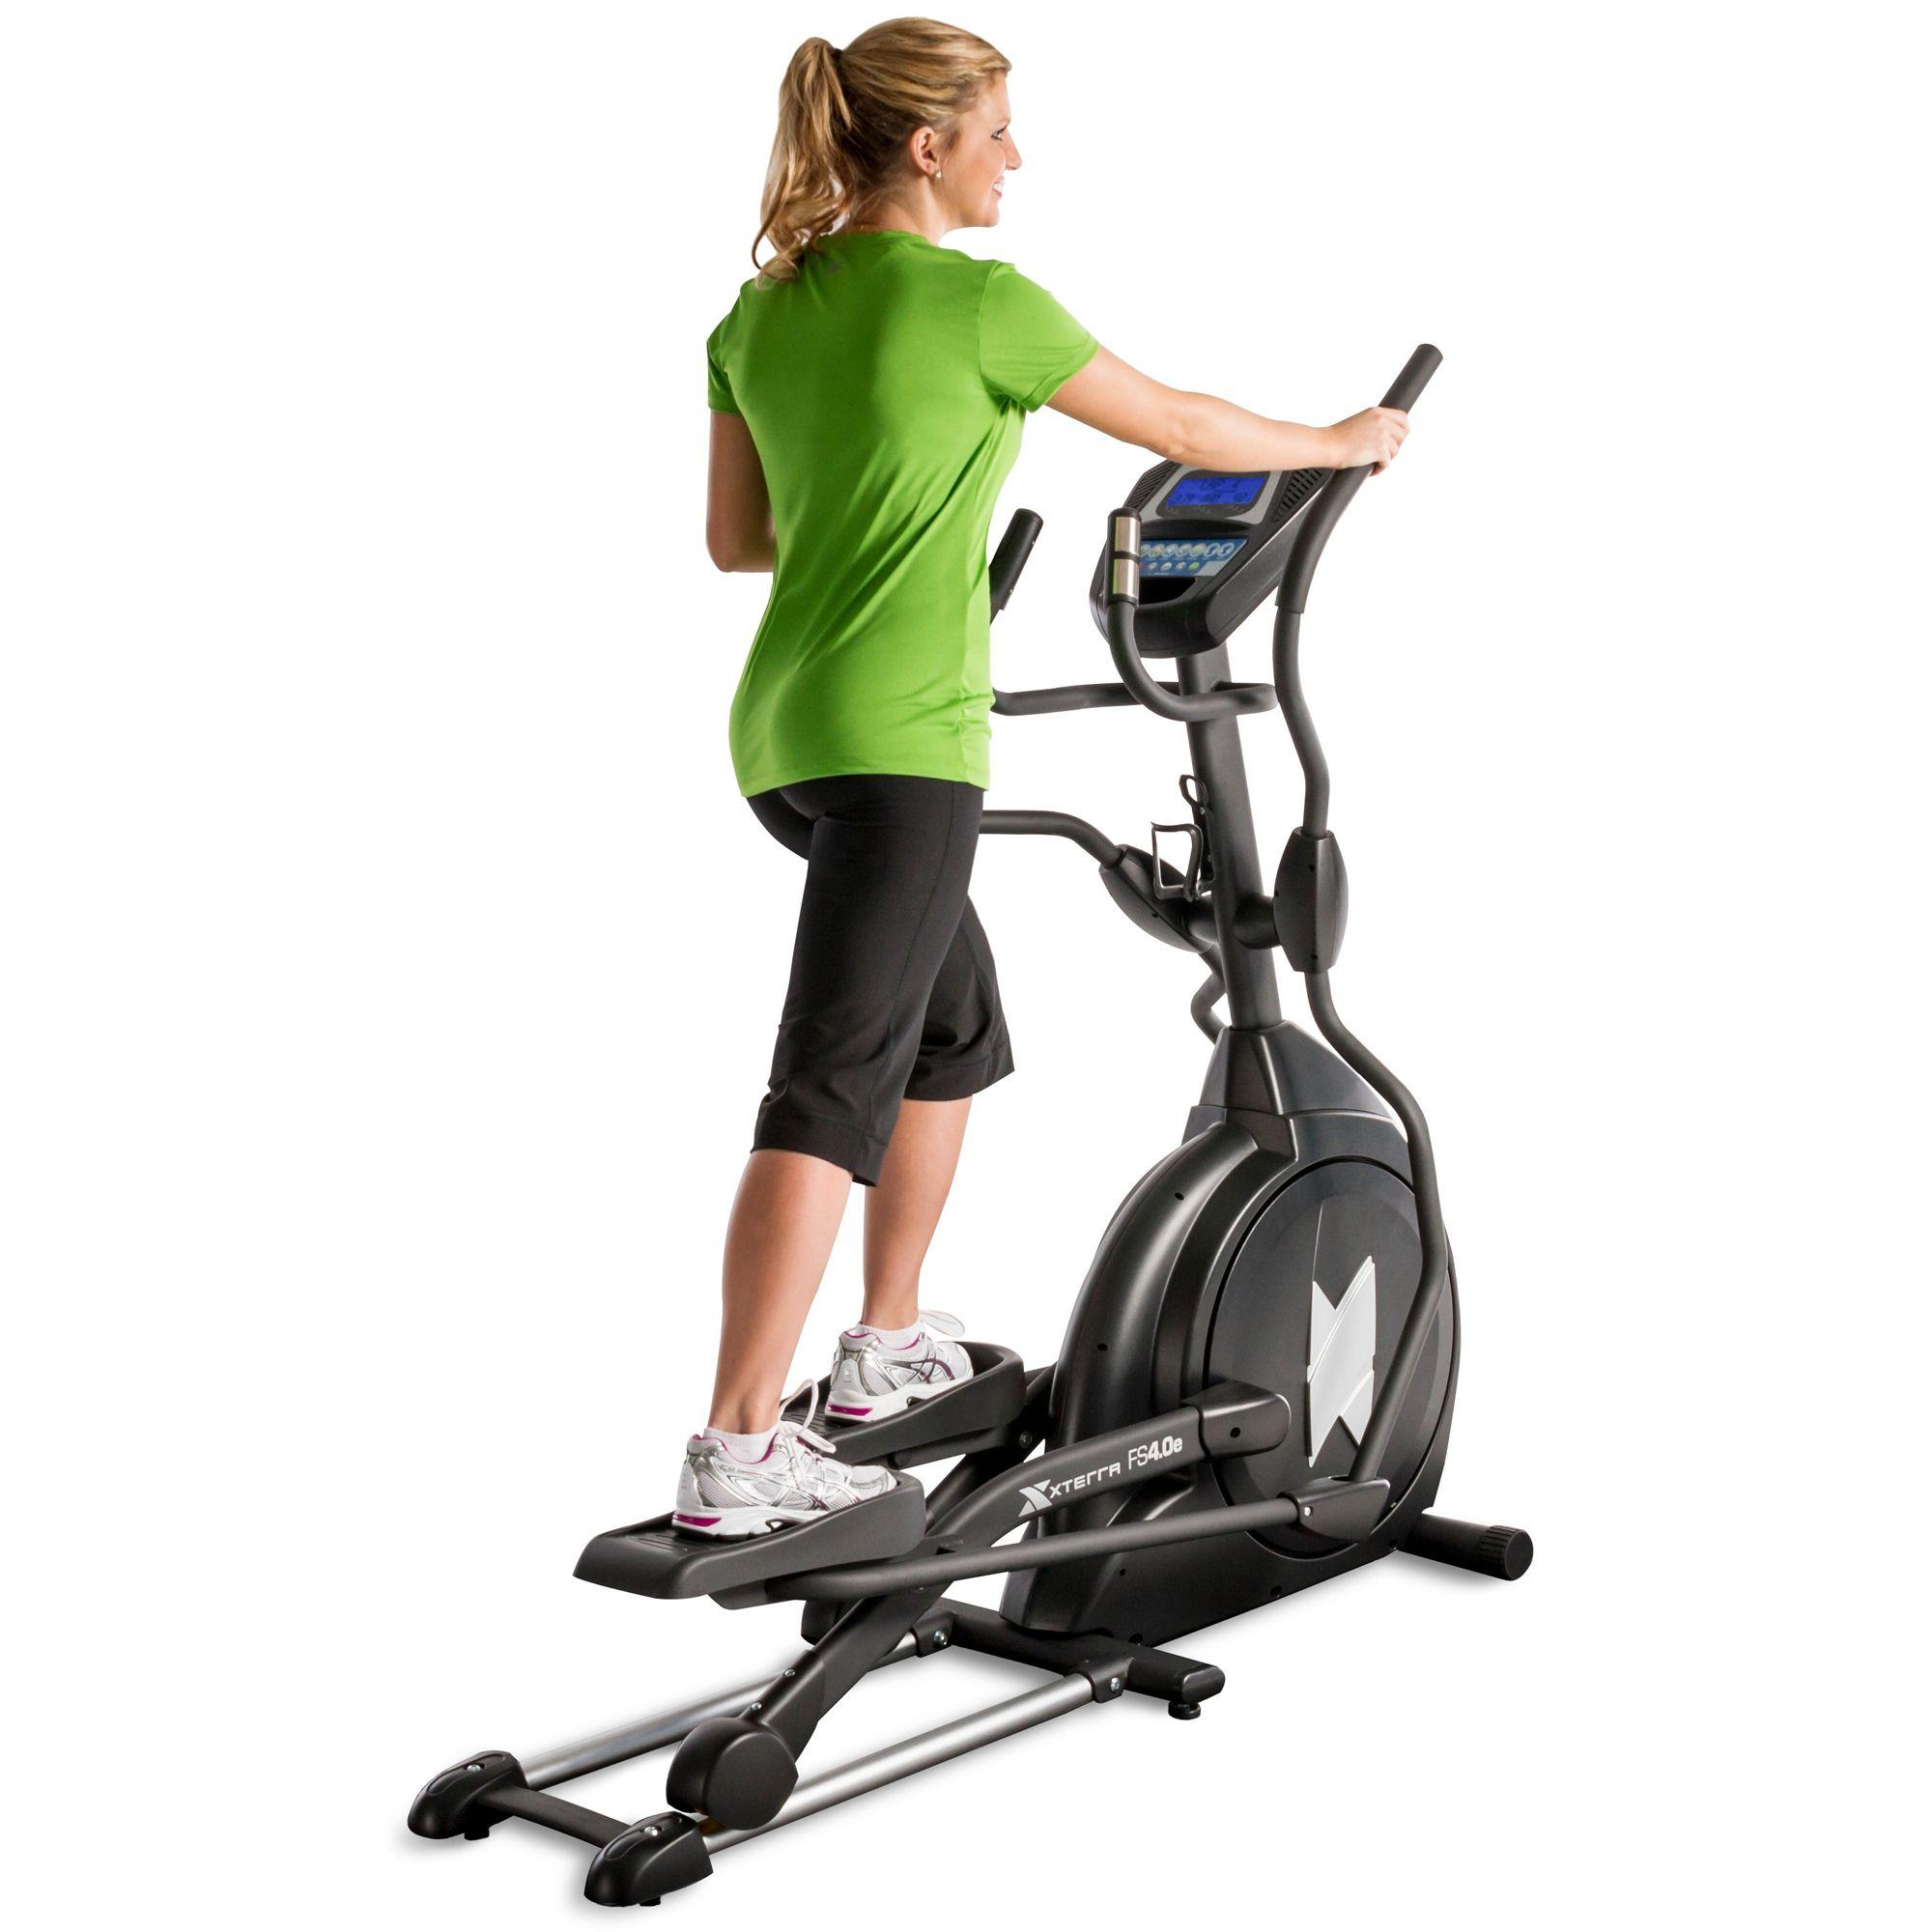 Nordictrack Cross Trainer >> Xterra Free Style 4.0e Elliptical Cross Trainer - Sweatband.com